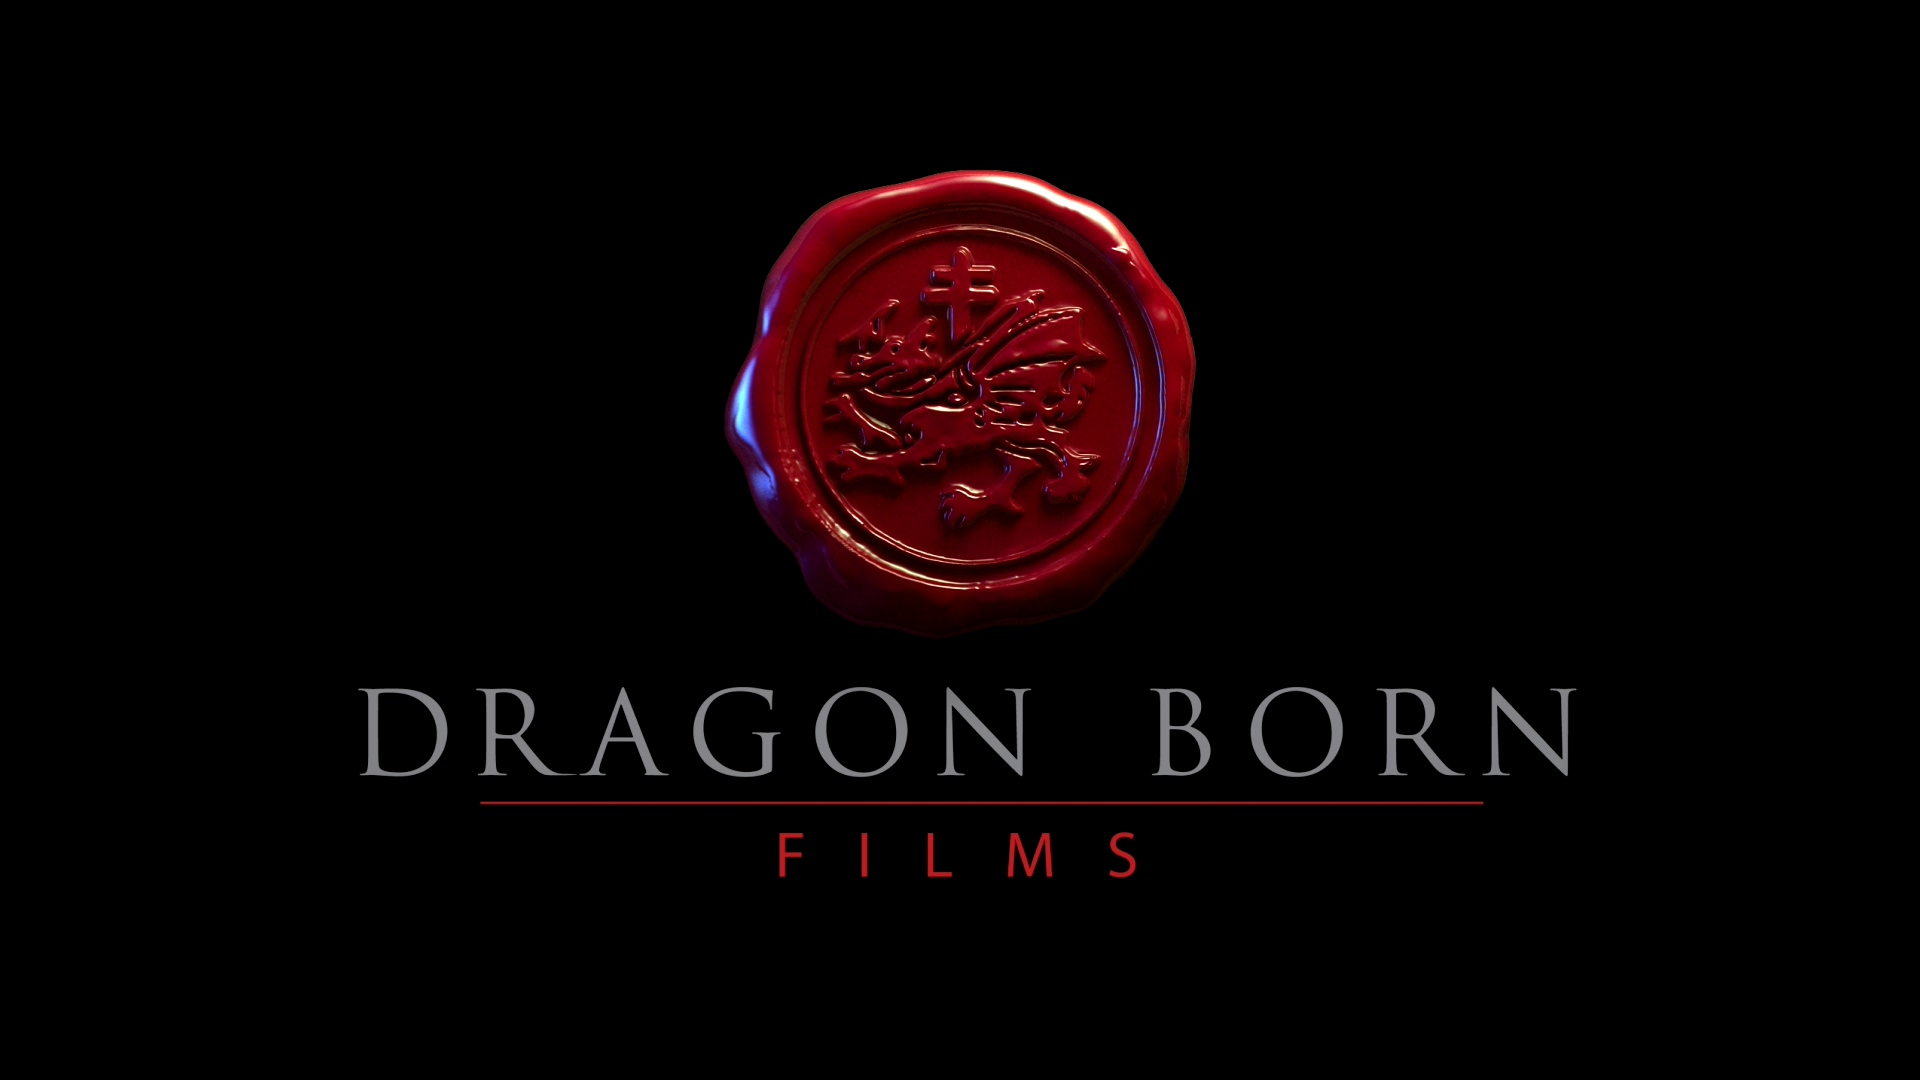 Dragon Born Films